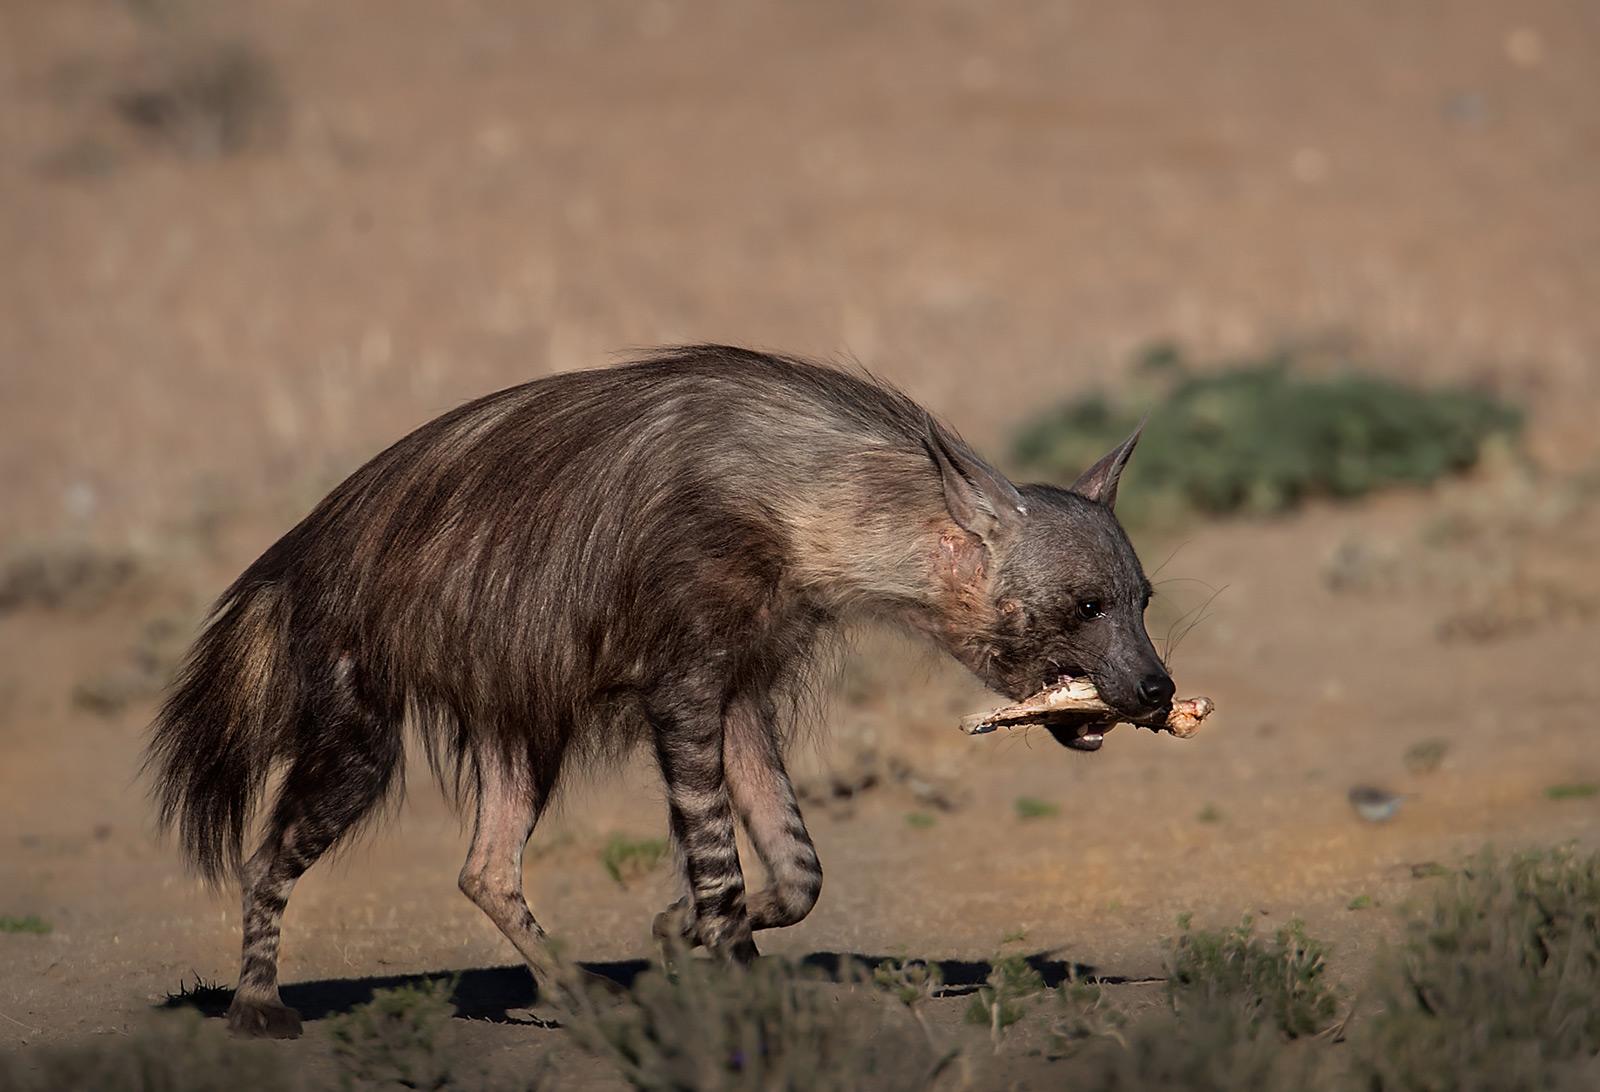 A brown hyena carrying a bone in Kgalagadi Transfrontier Park